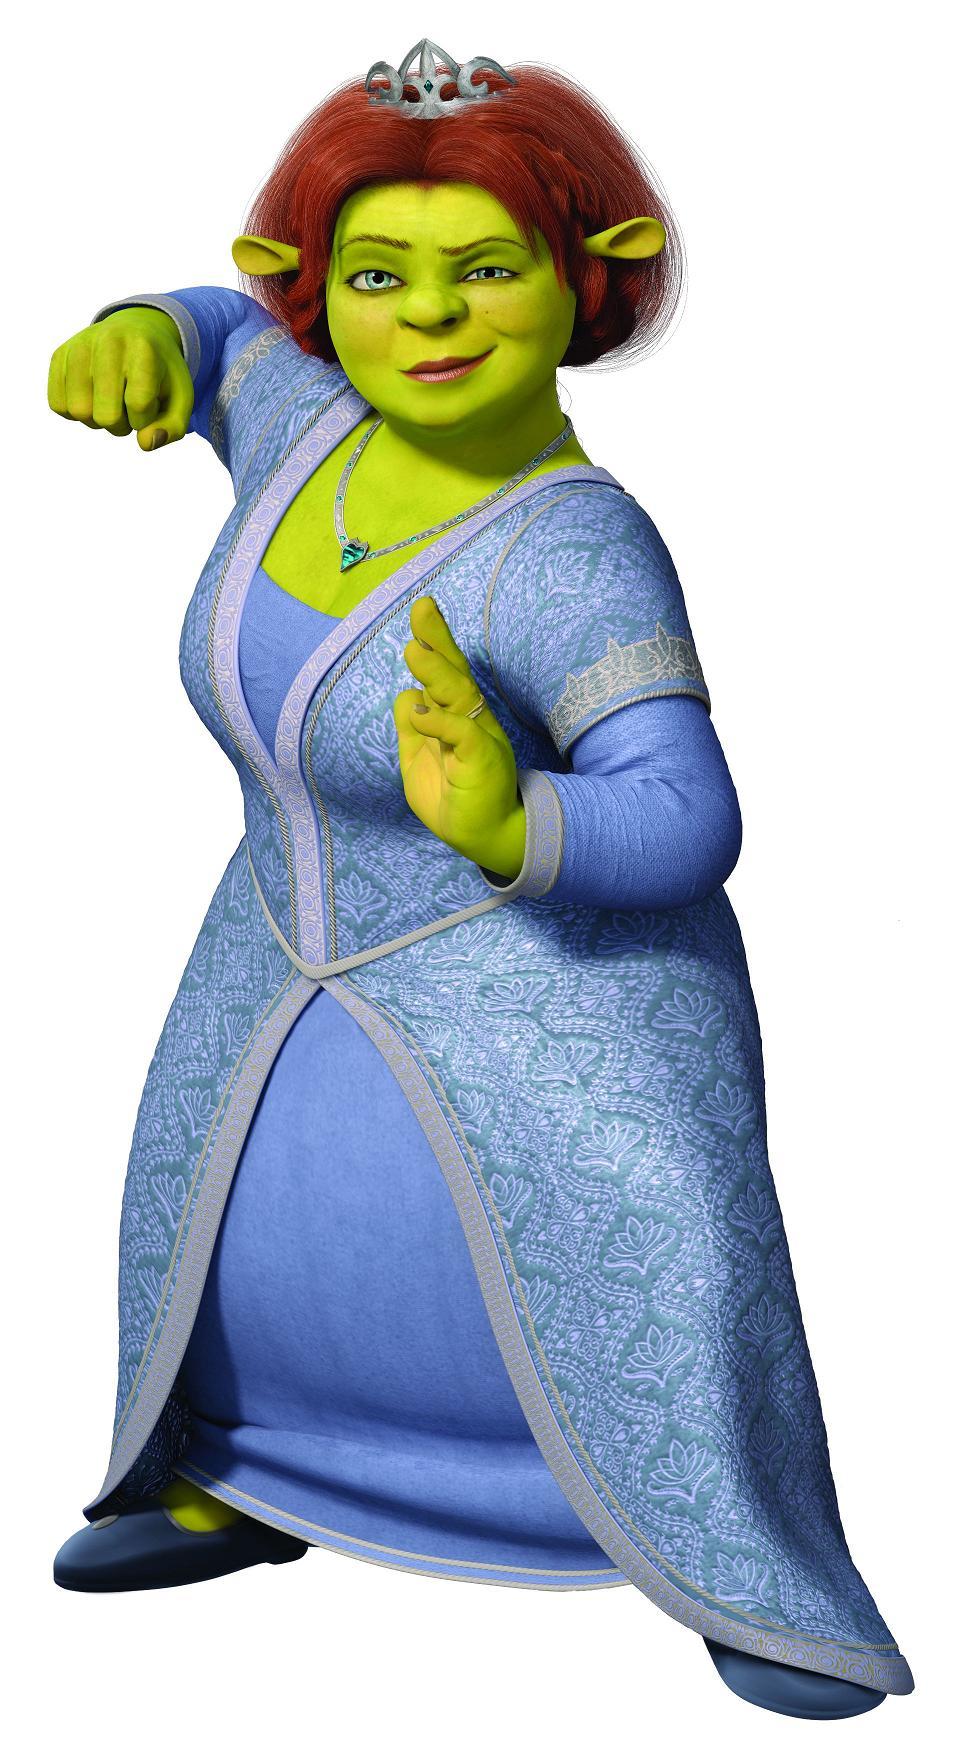 Princess fiona pooh 39 s adventures wiki fandom powered - Images princesse ...